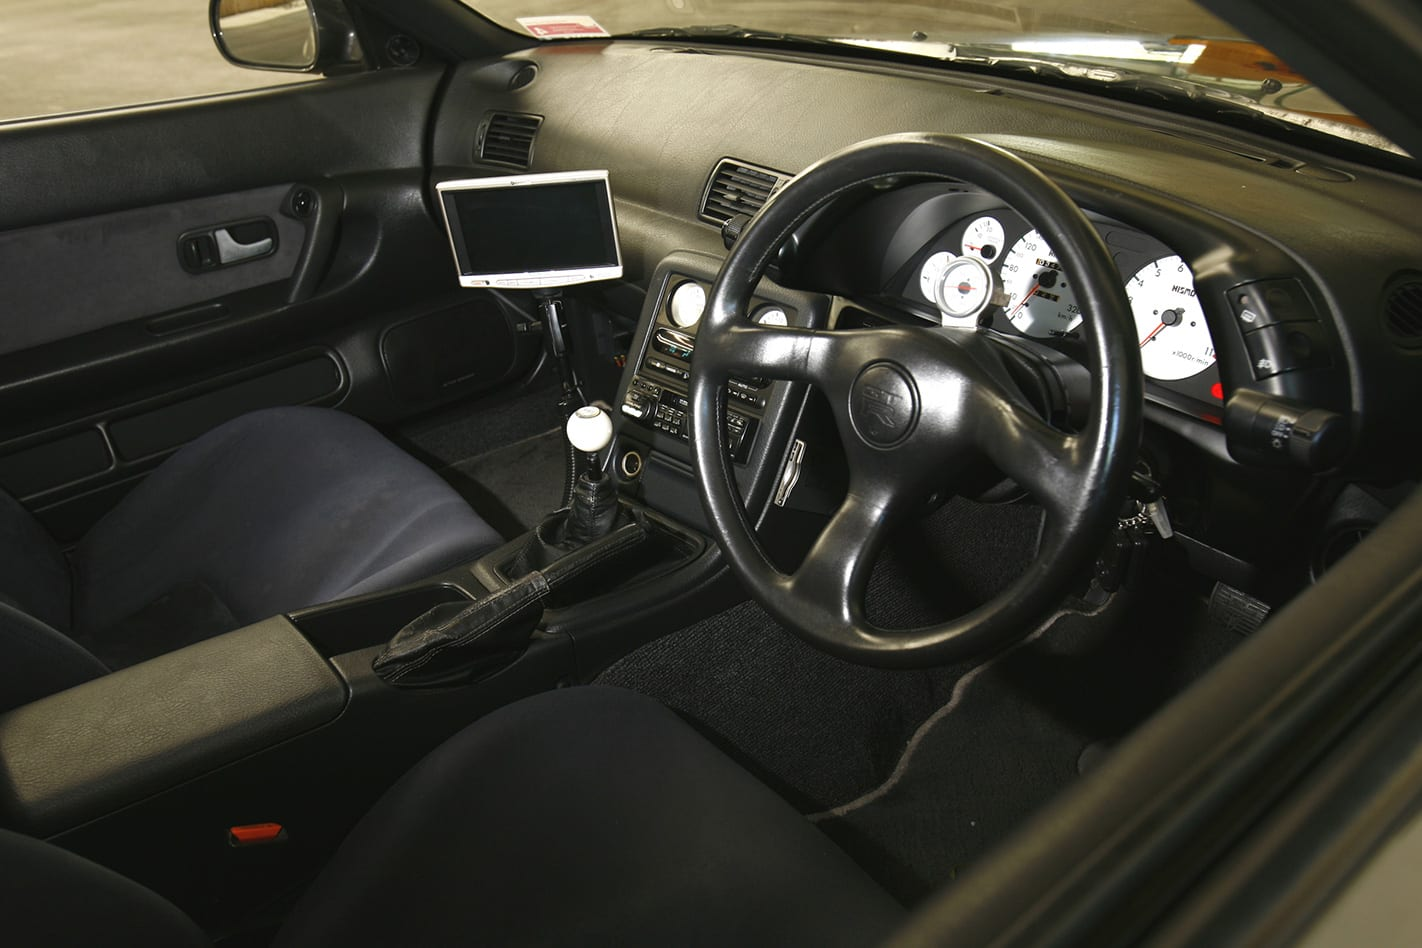 Nissan Skyline R32 GT-R interior